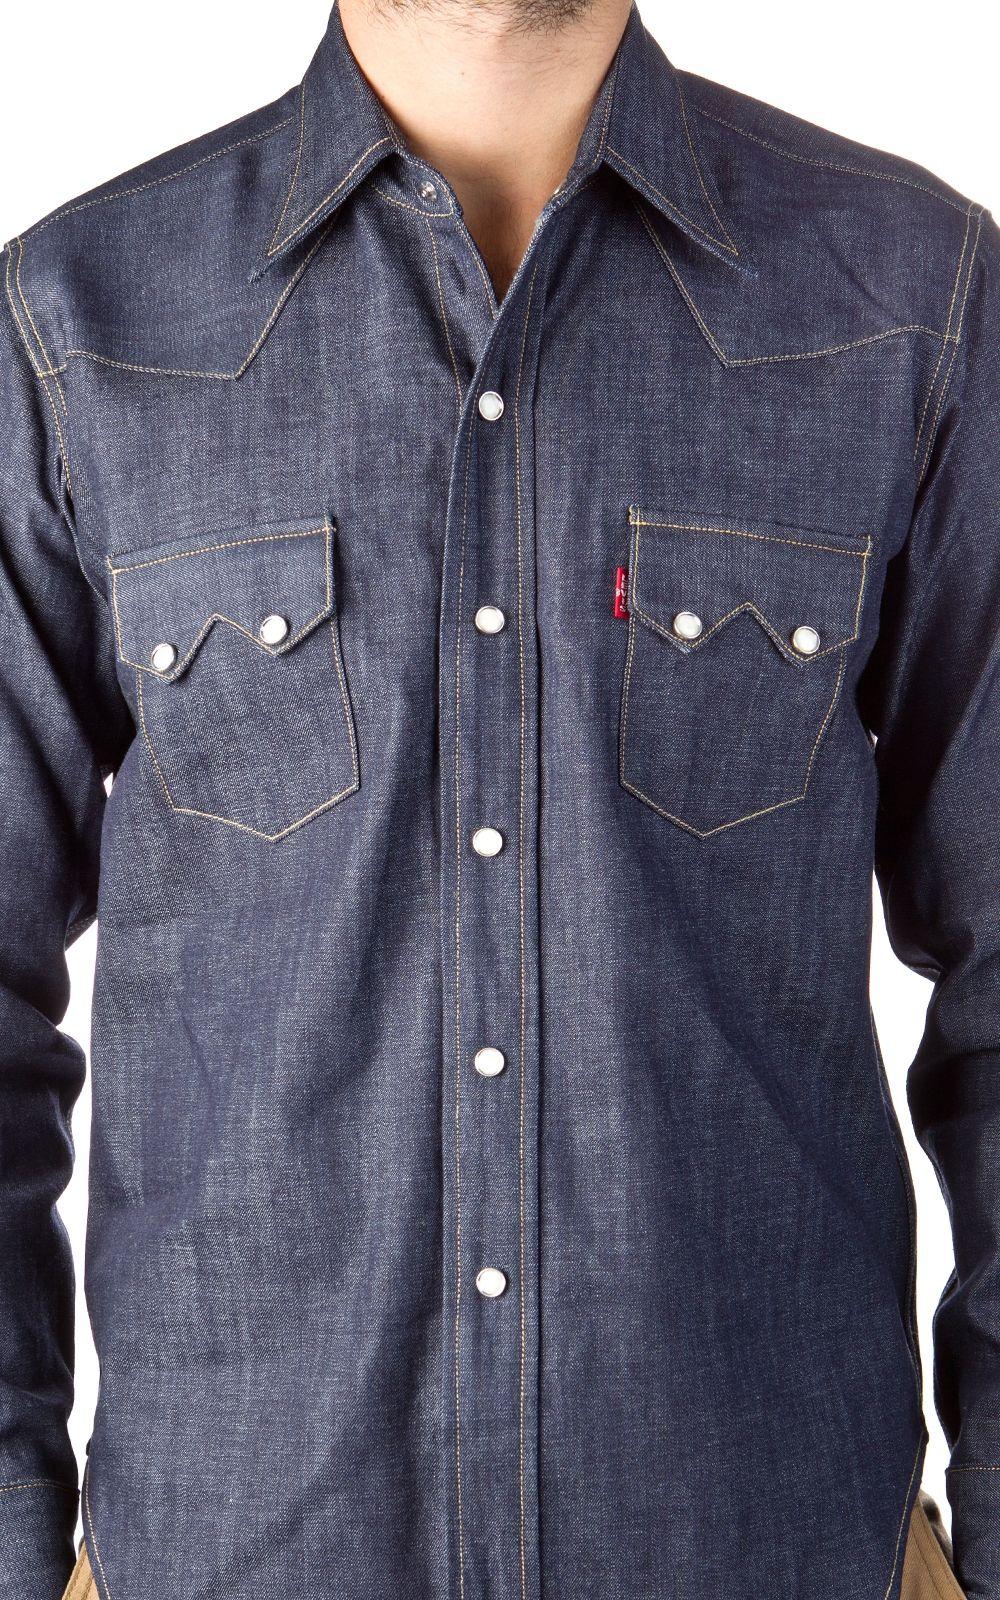 be8eb11f Levi's® Vintage Clothing 1955 Sawtooth Denim Shirt Rigid | Denim ...